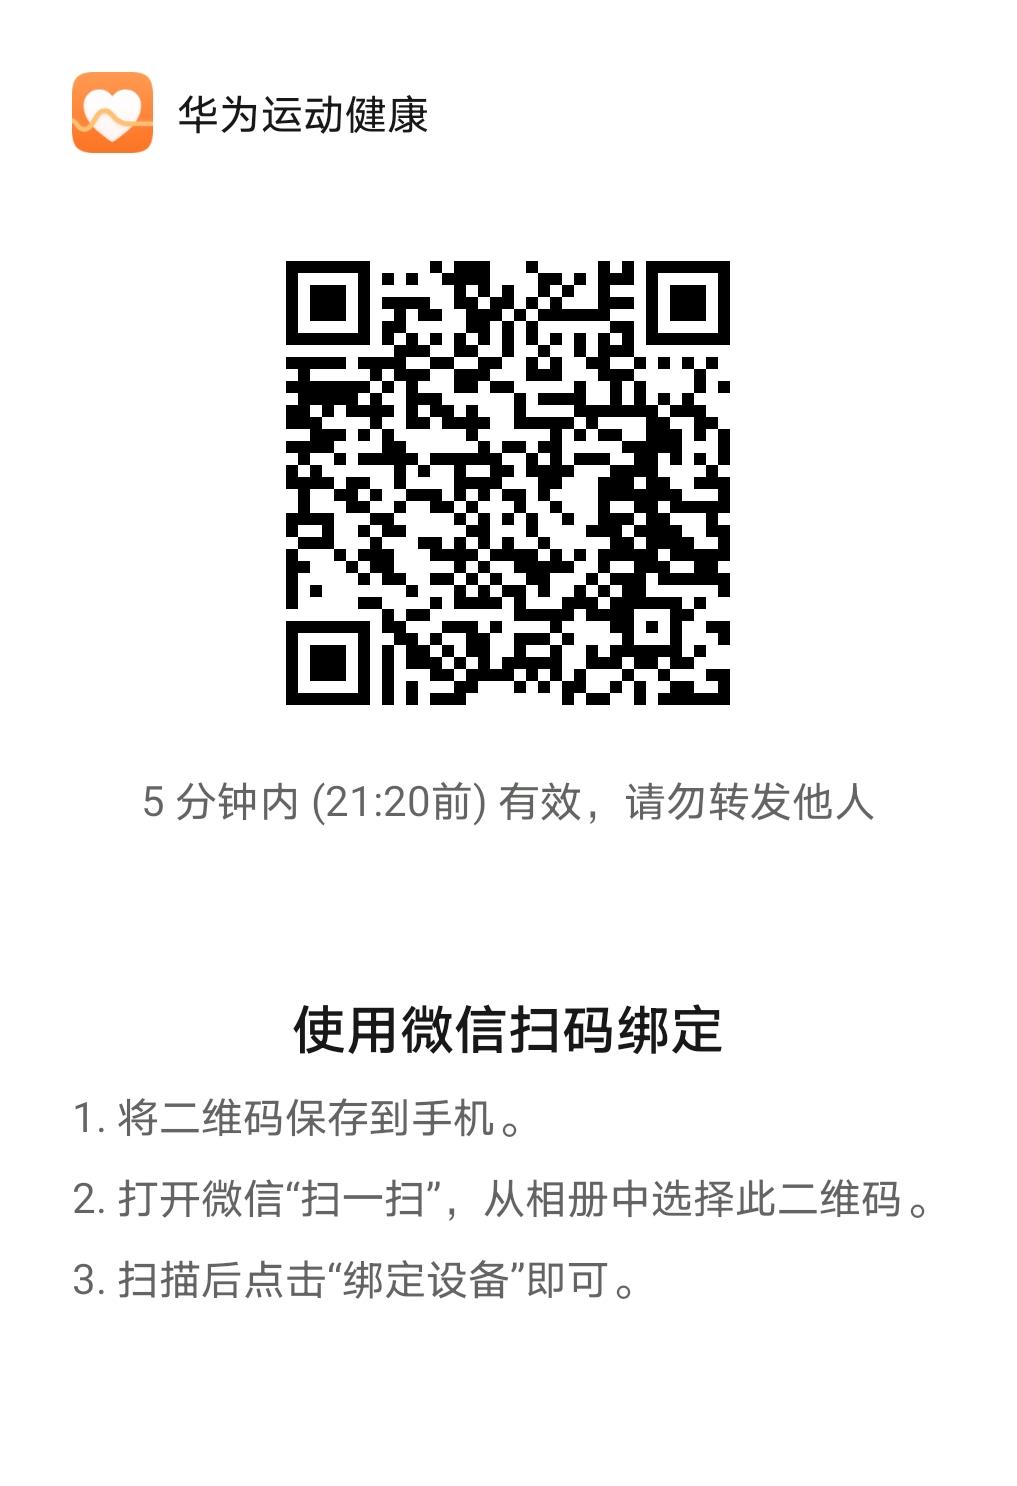 sporthealth-1-20210918-211530.jpg